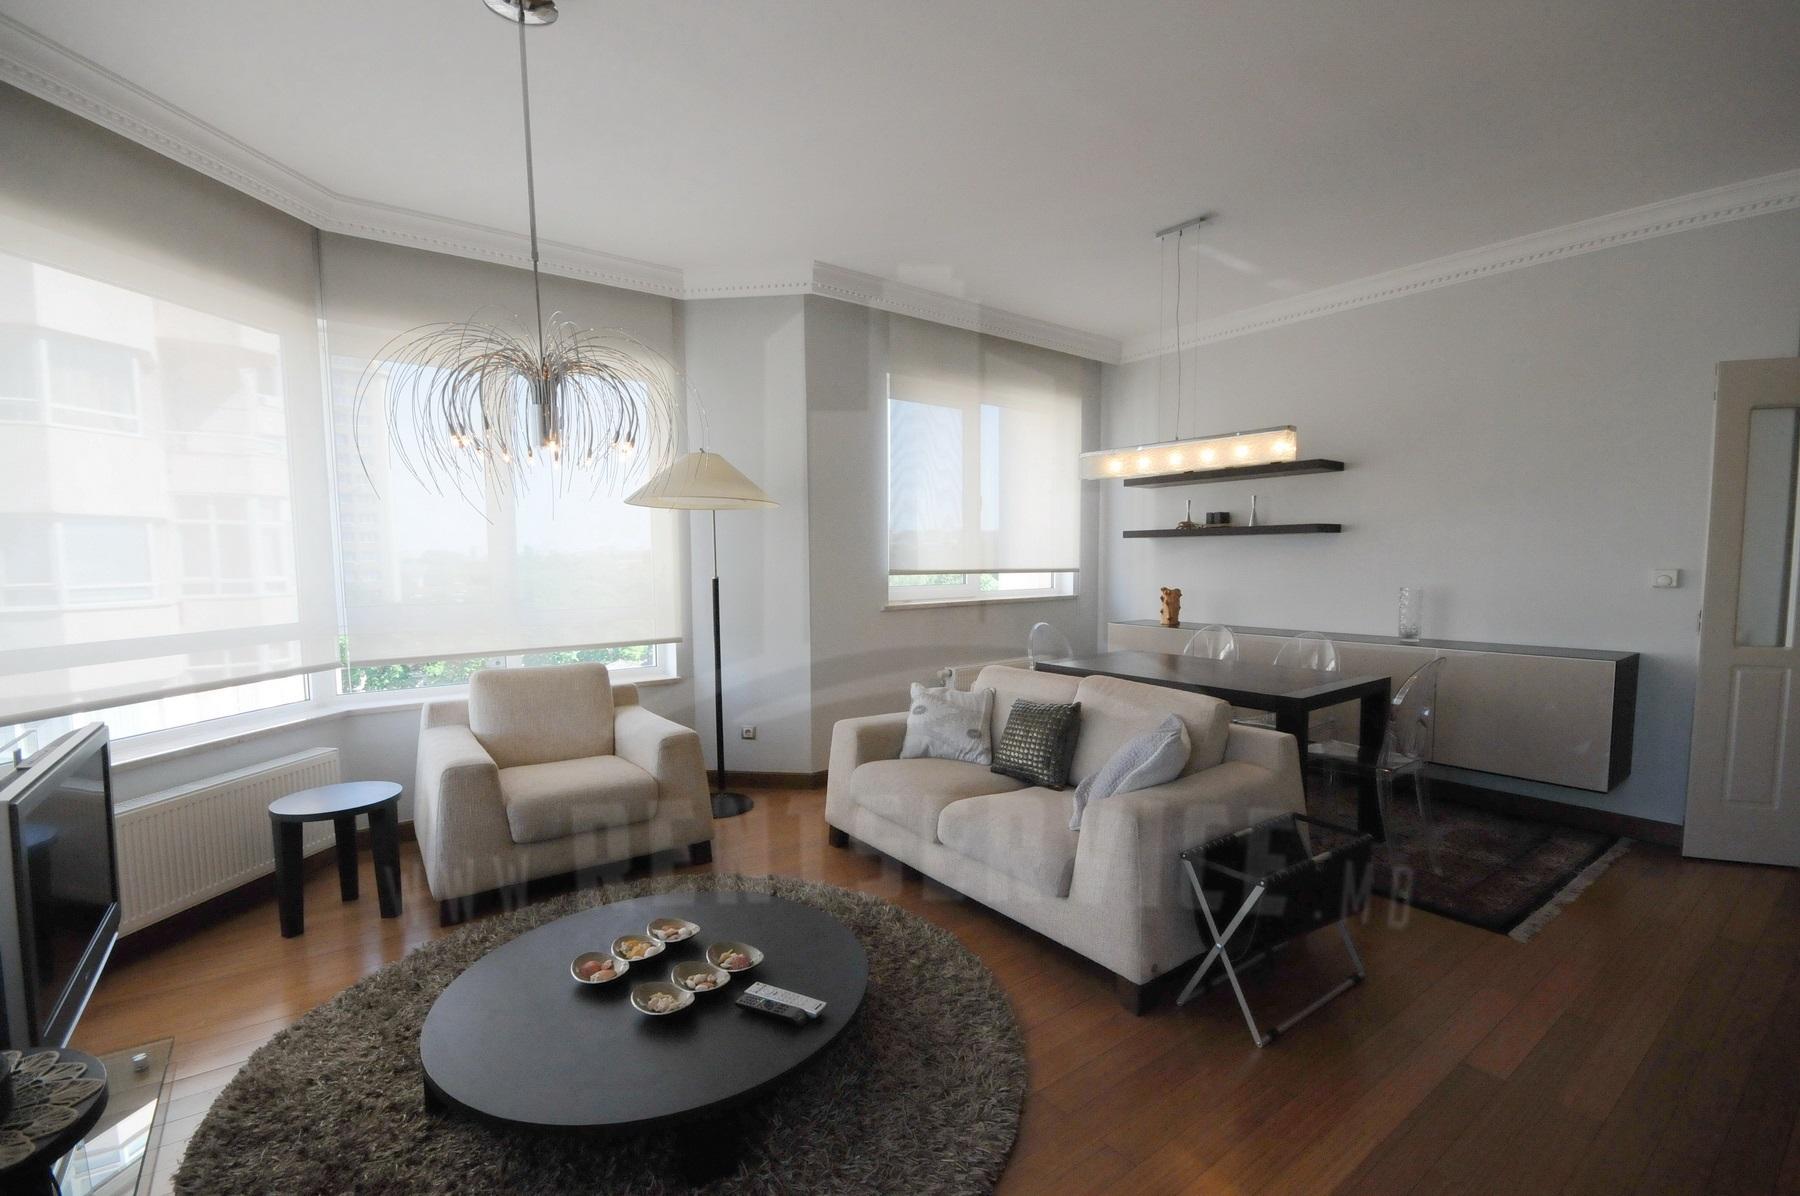 2054_apartment_1.JPG